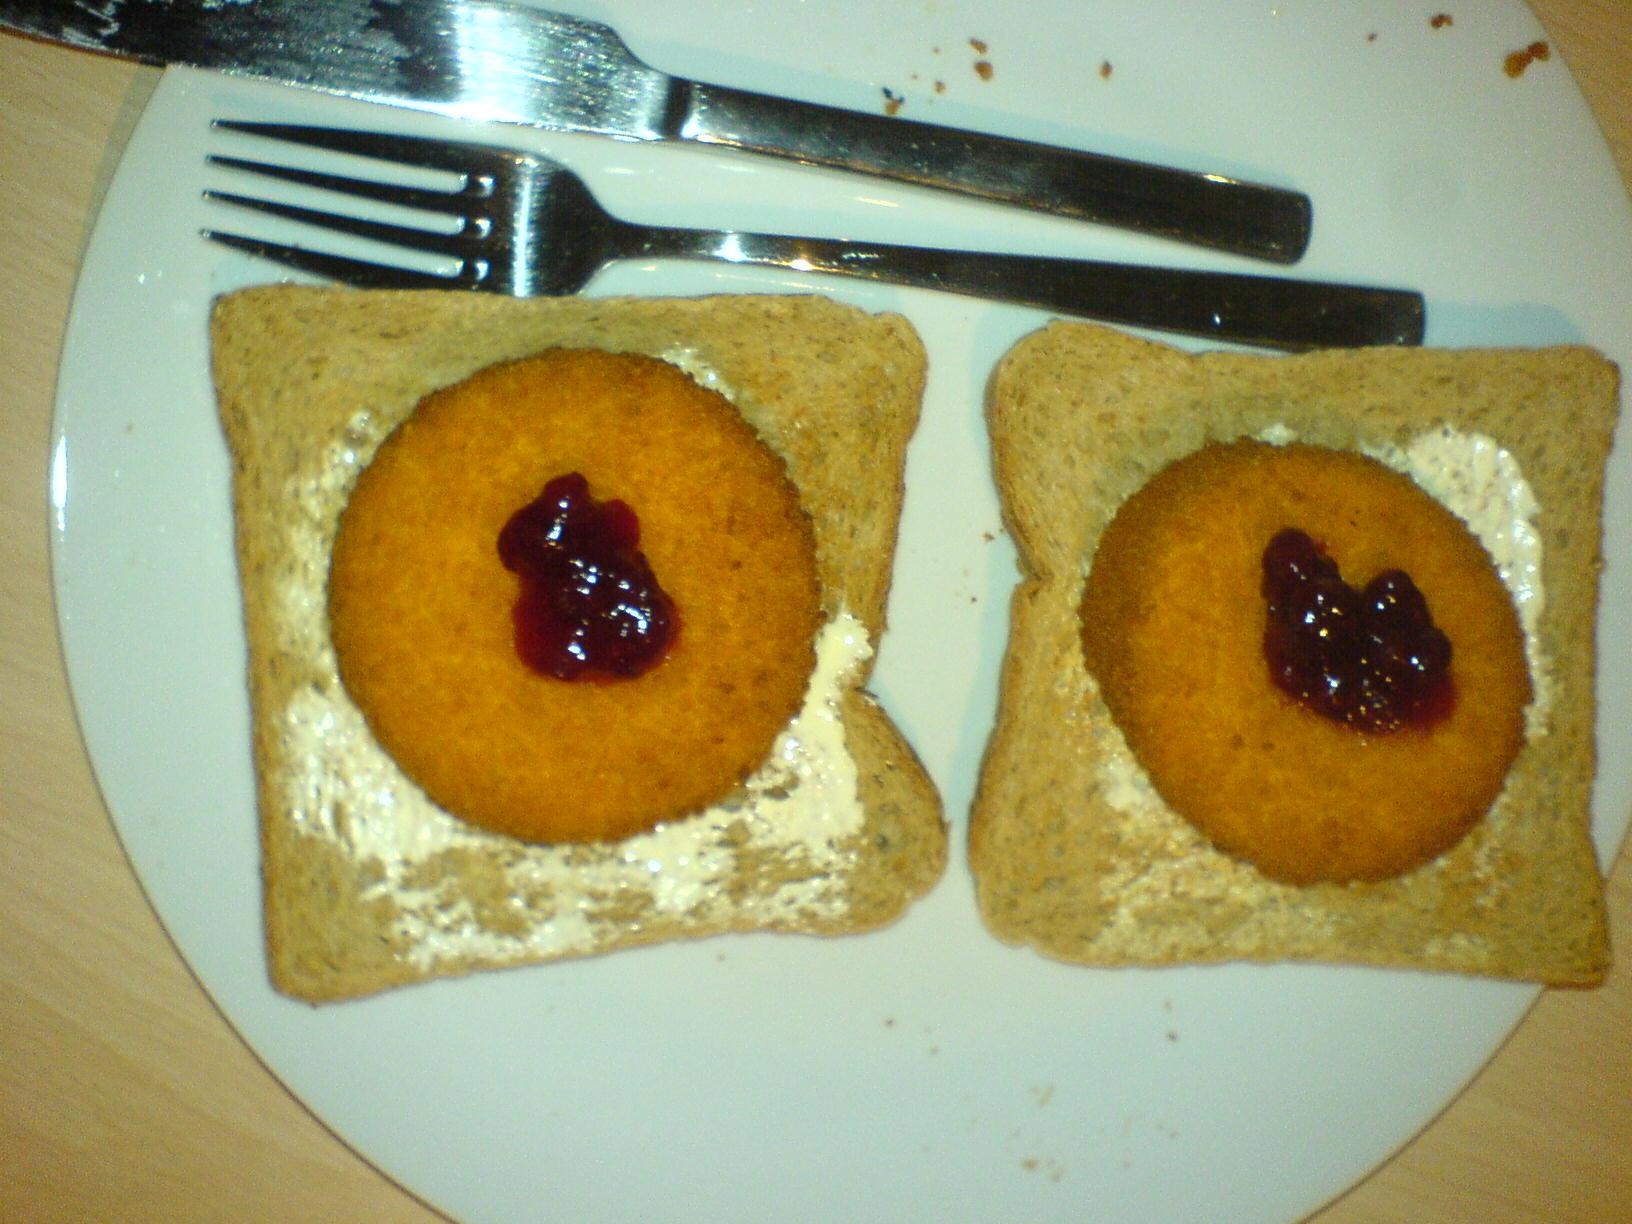 https://foodloader.net/Holz_2008-12-31_gebackener_Camembert_auf_Toasts.jpg